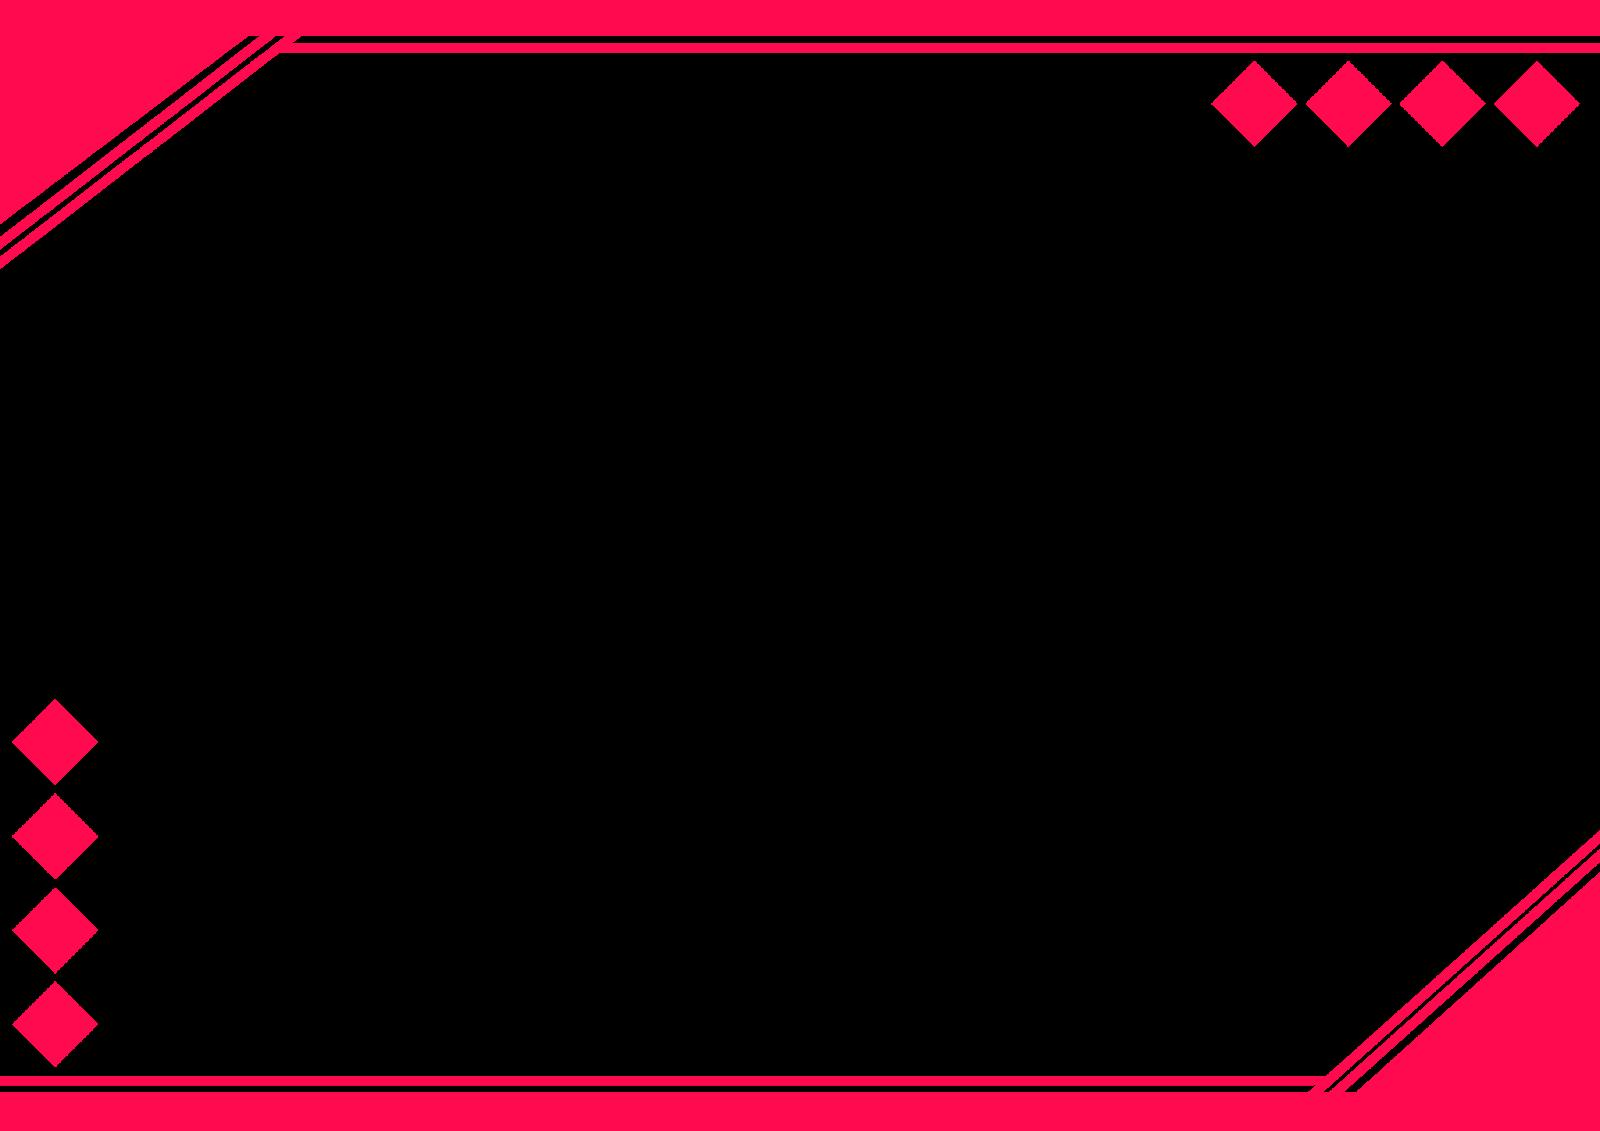 Bingkai Sertifikat Png Download Background Sertifikat Images Free Trans Certificate Design Template Poster Background Design Powerpoint Background Templates